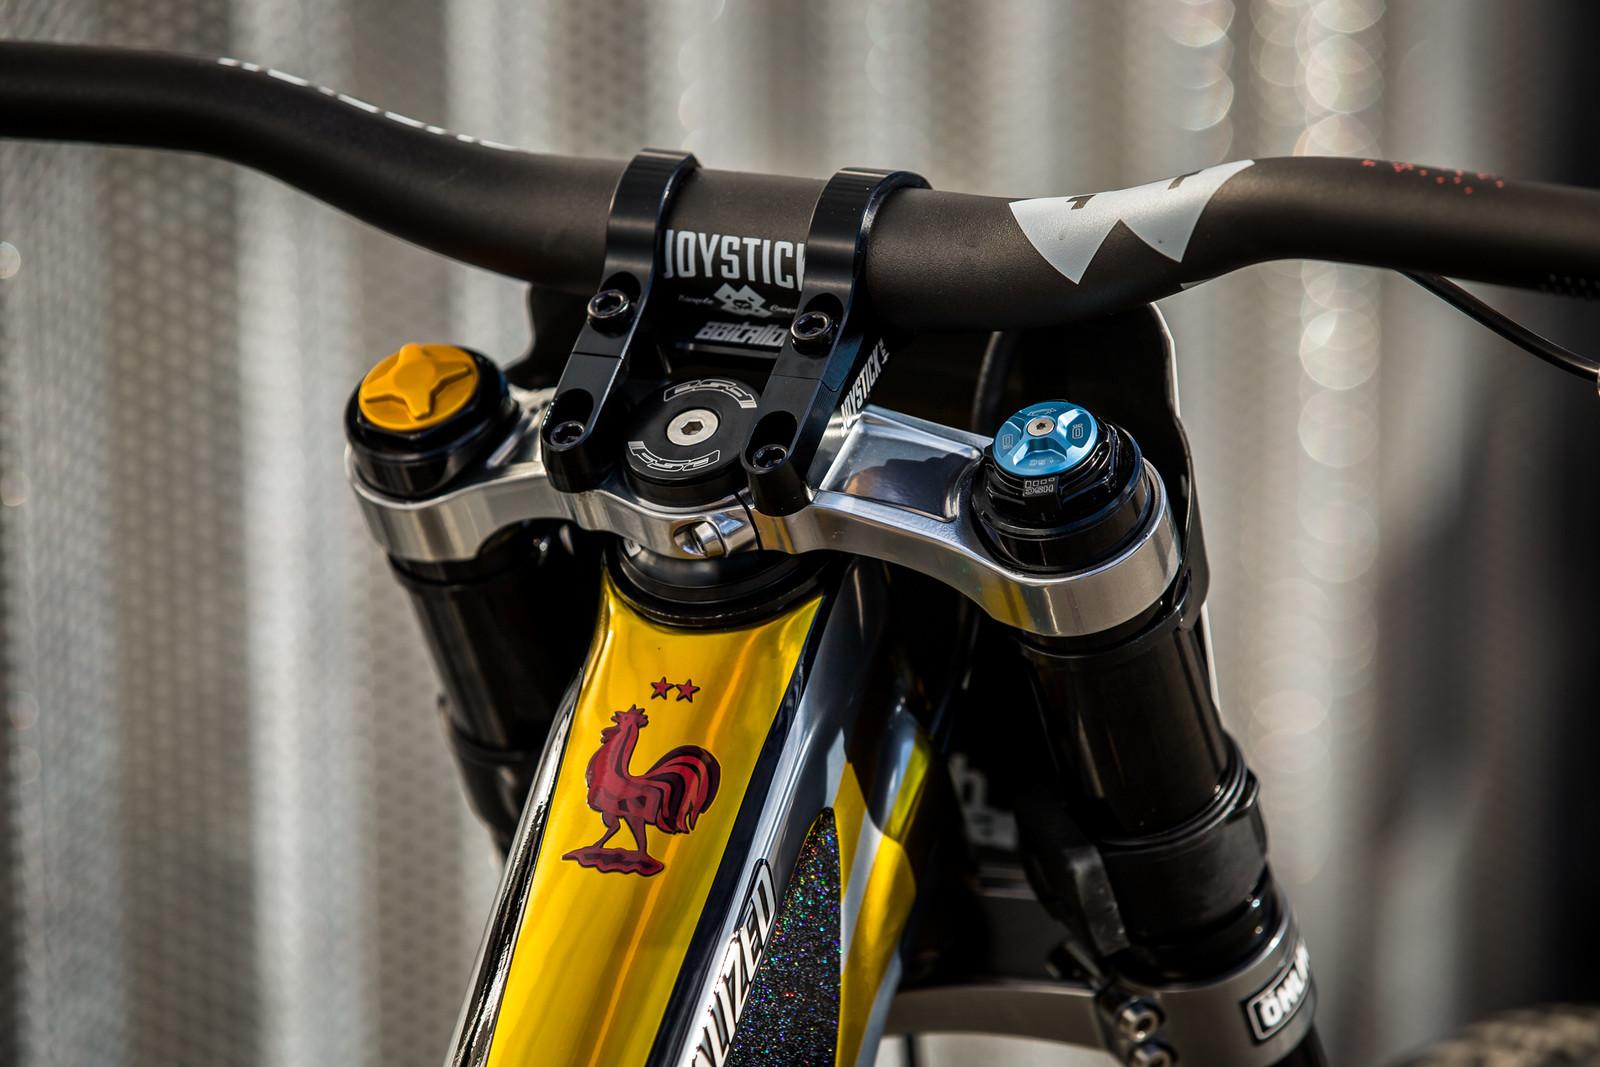 Joystick Cockpit - WORLD CHAMPS BIKE - Loic Bruni's Specialized Demo - Mountain Biking Pictures - Vital MTB